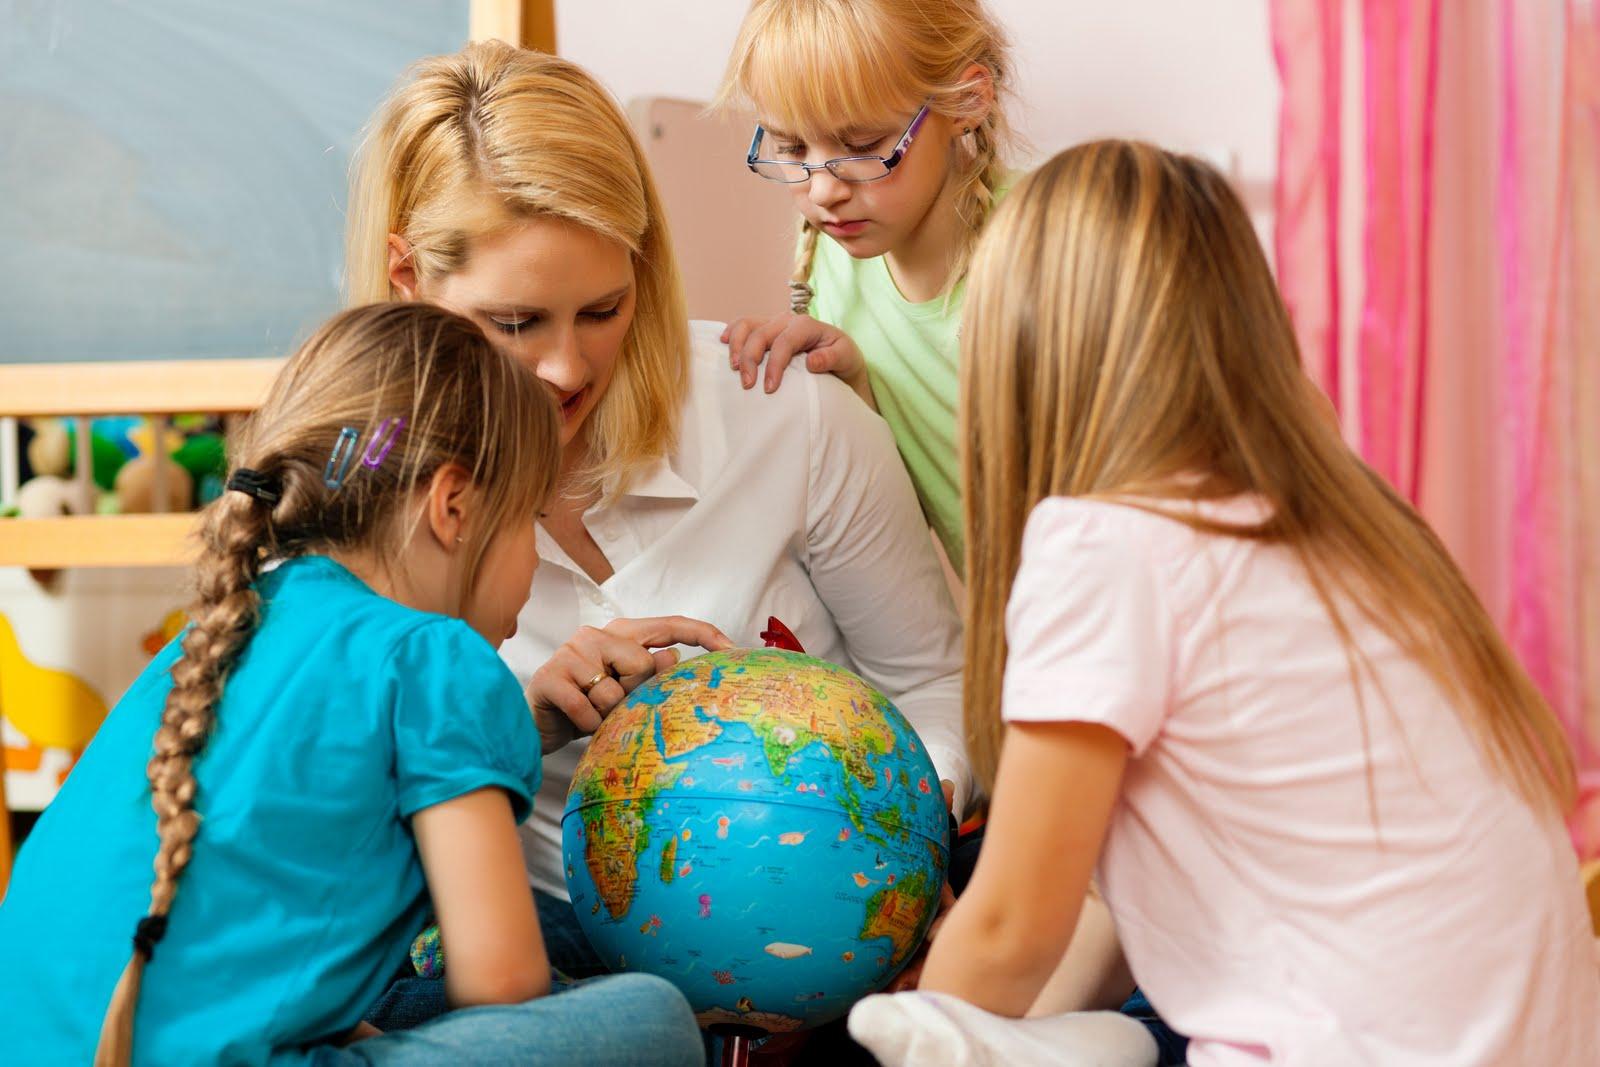 Kindergarten Worksheets Why Are Positive Role Models